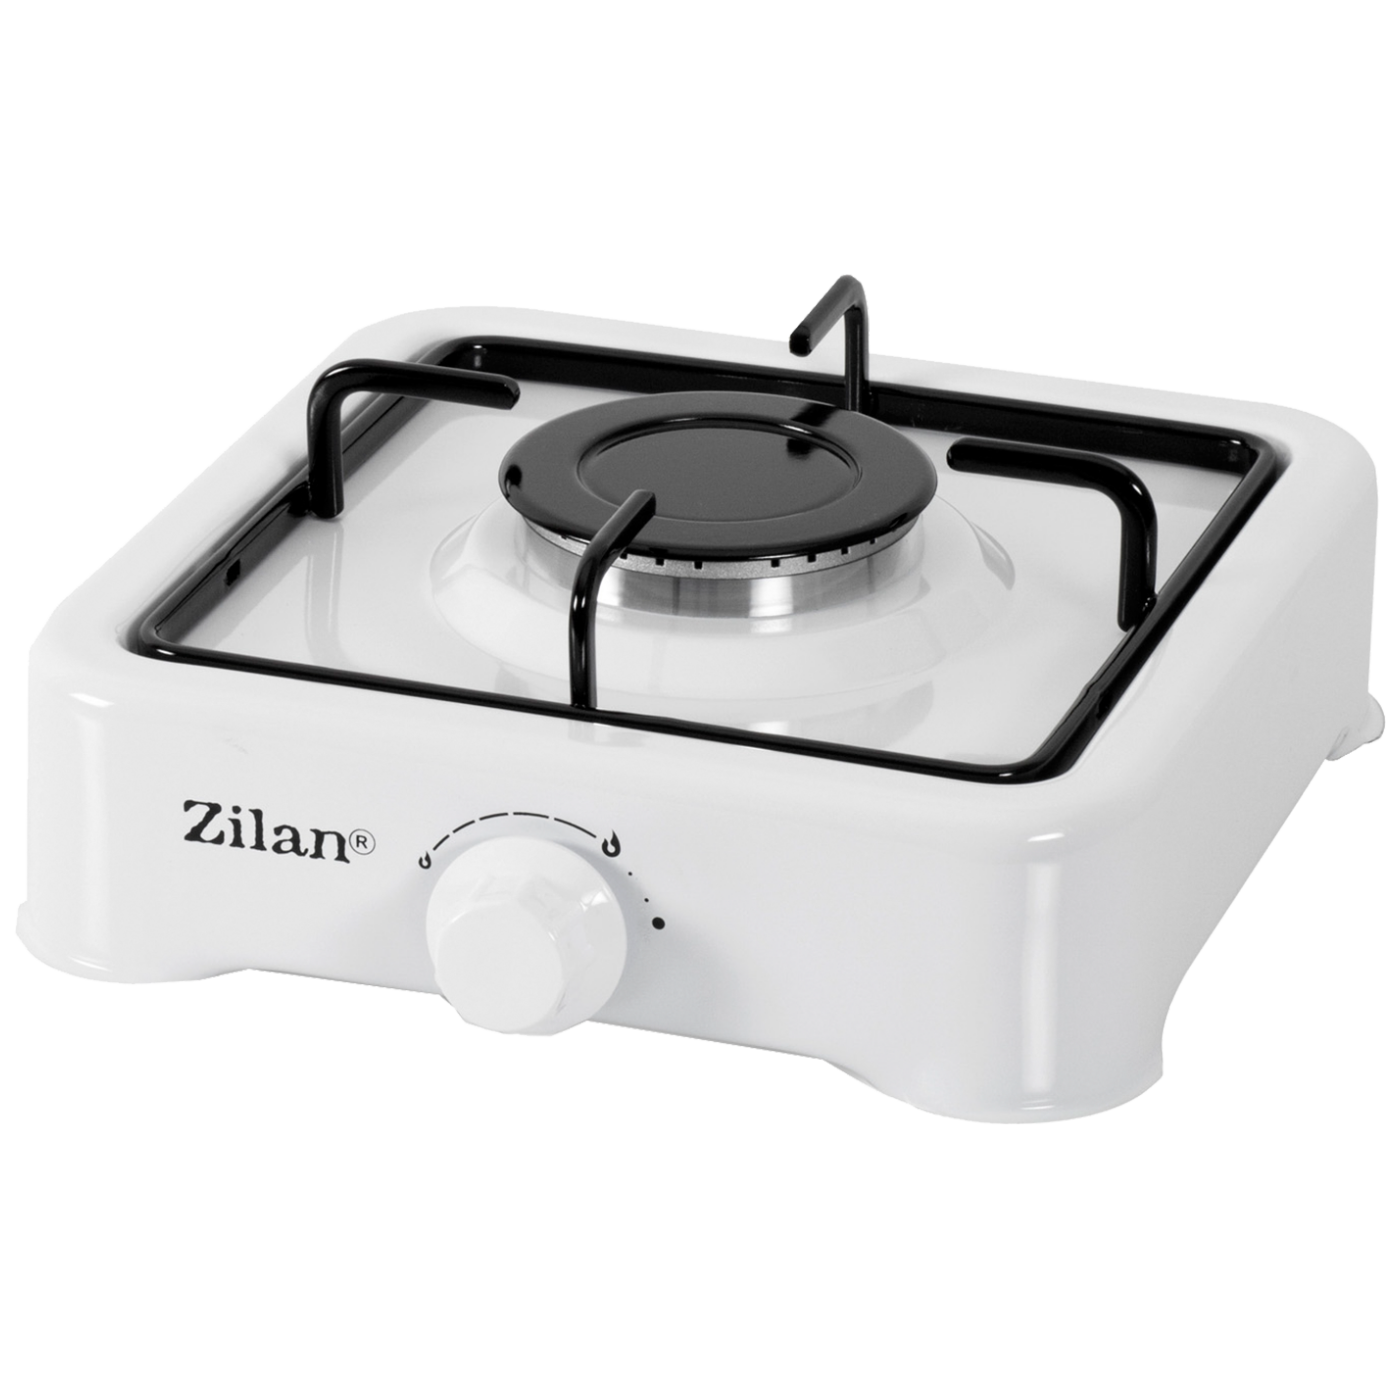 Zilan - ZLN0018/WH